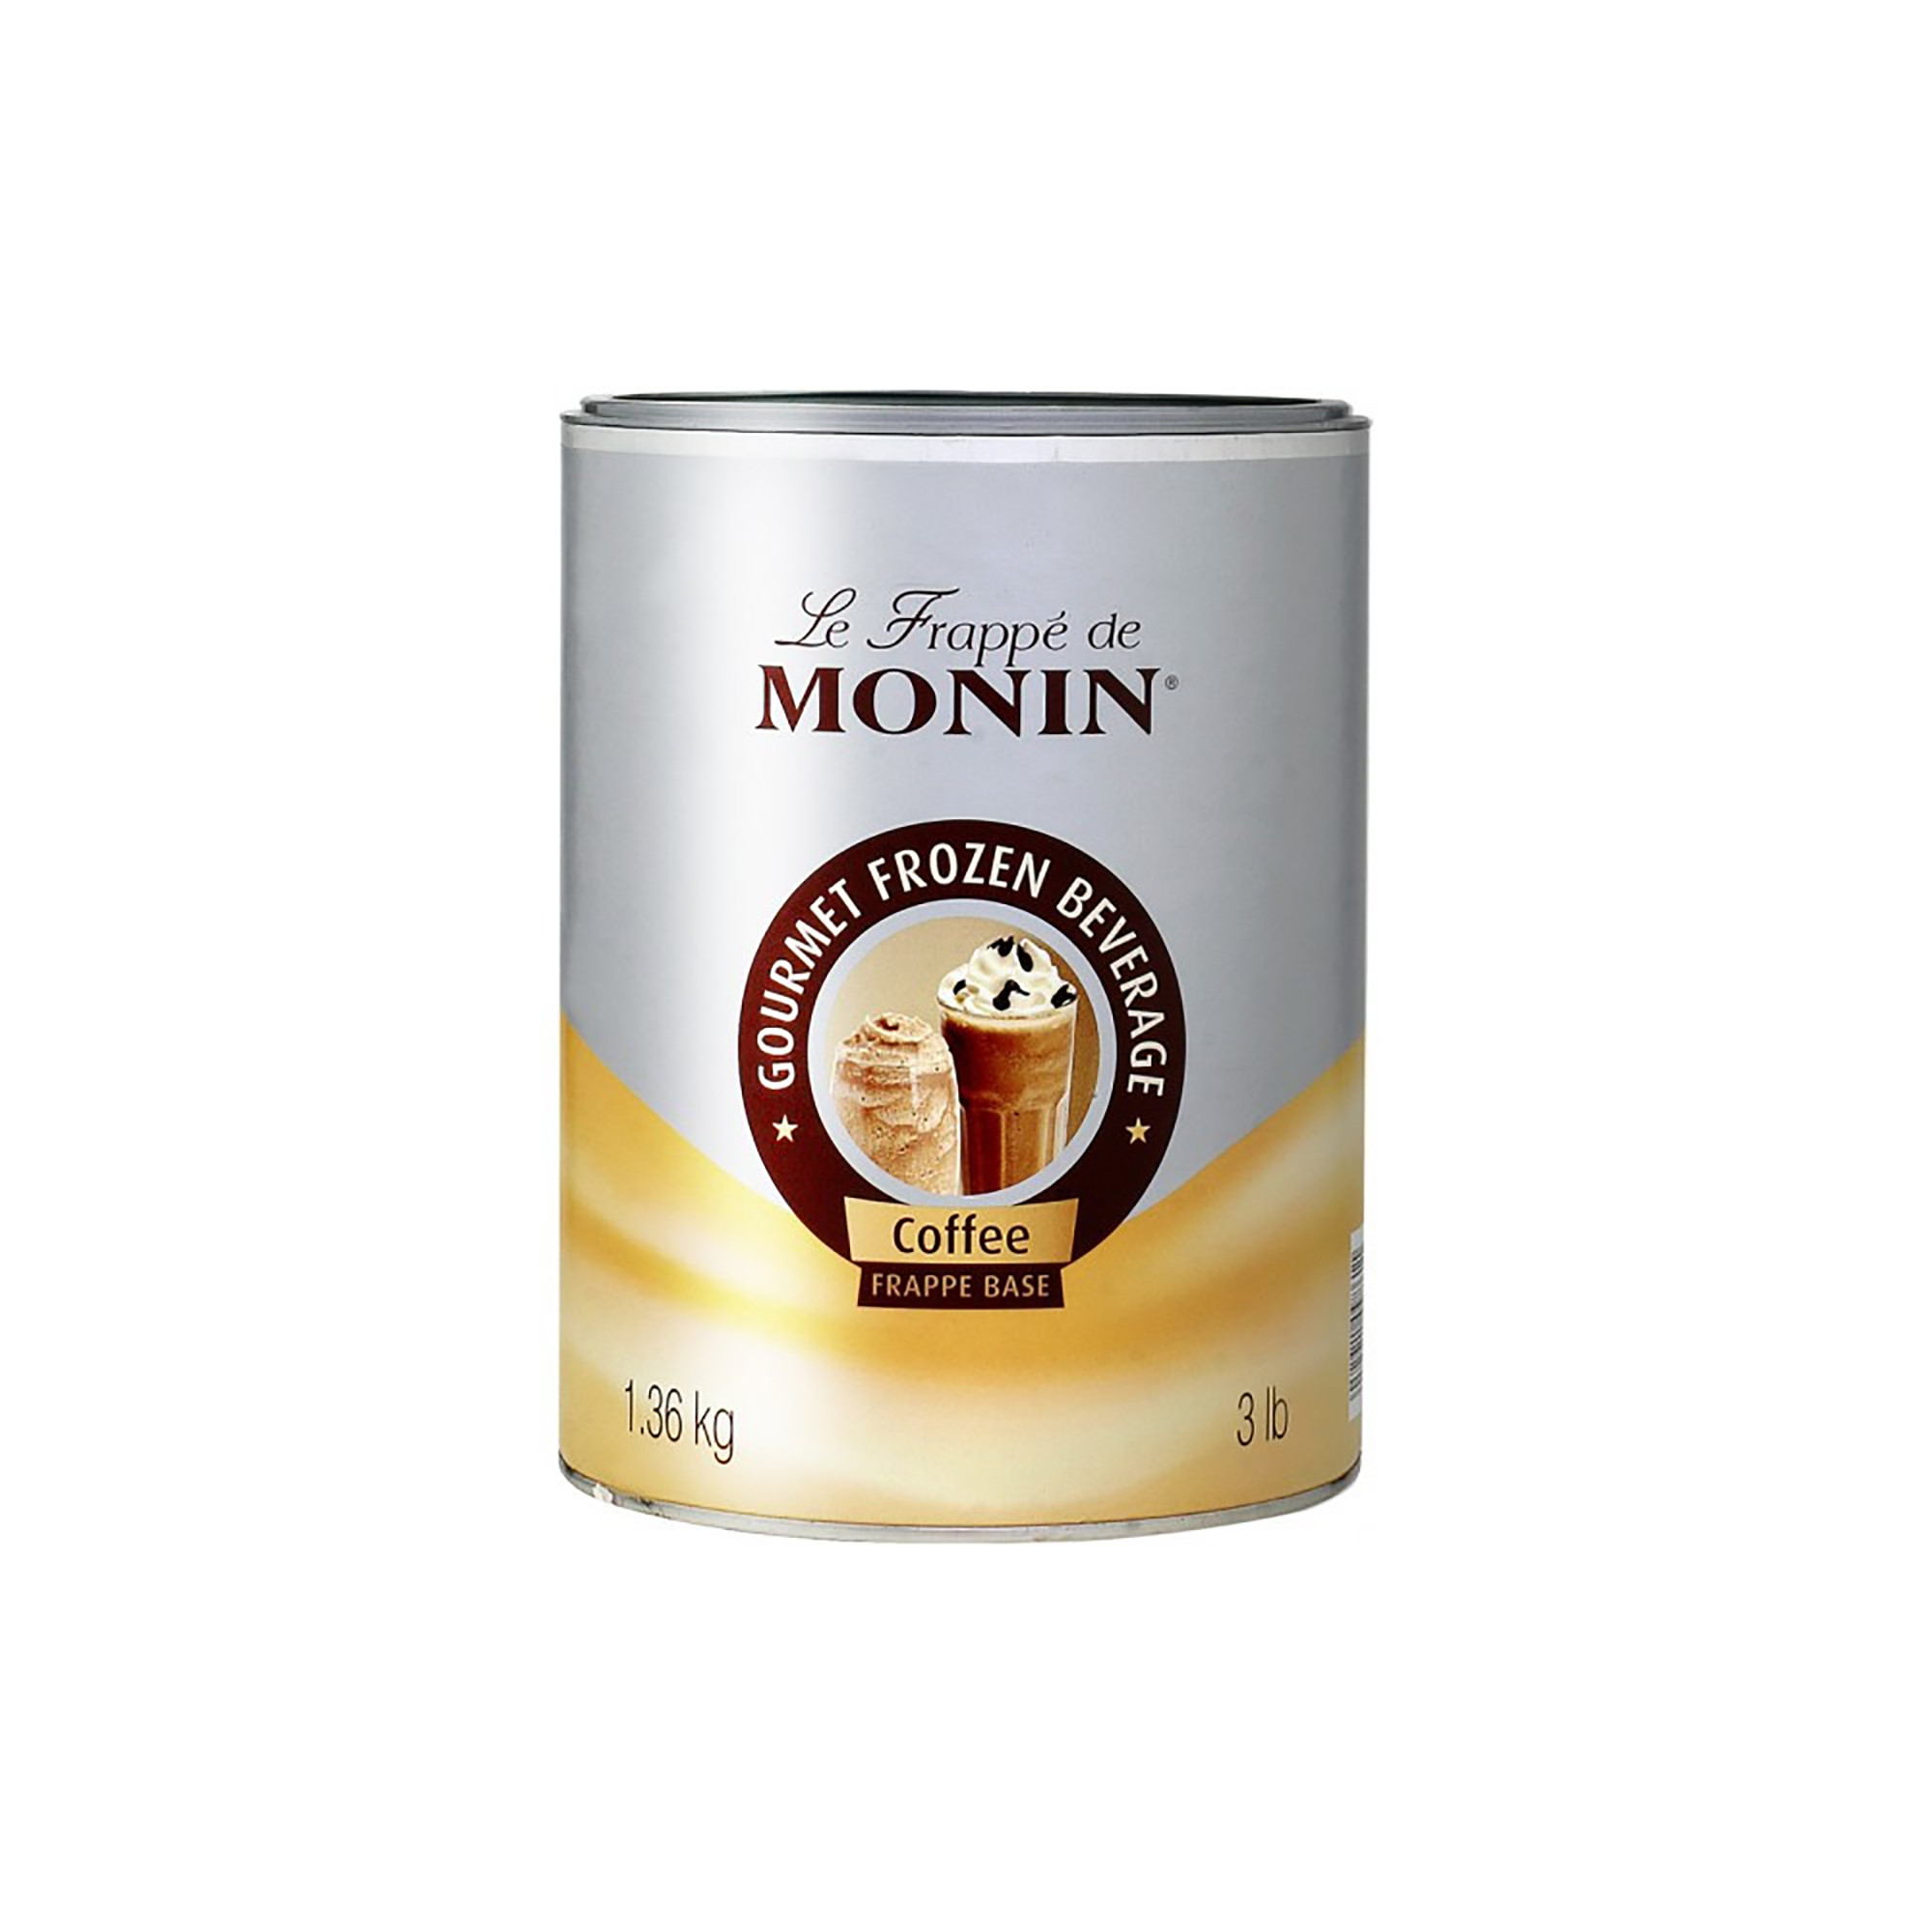 Monin Frappé Base, Kaffe - 1,36 kg